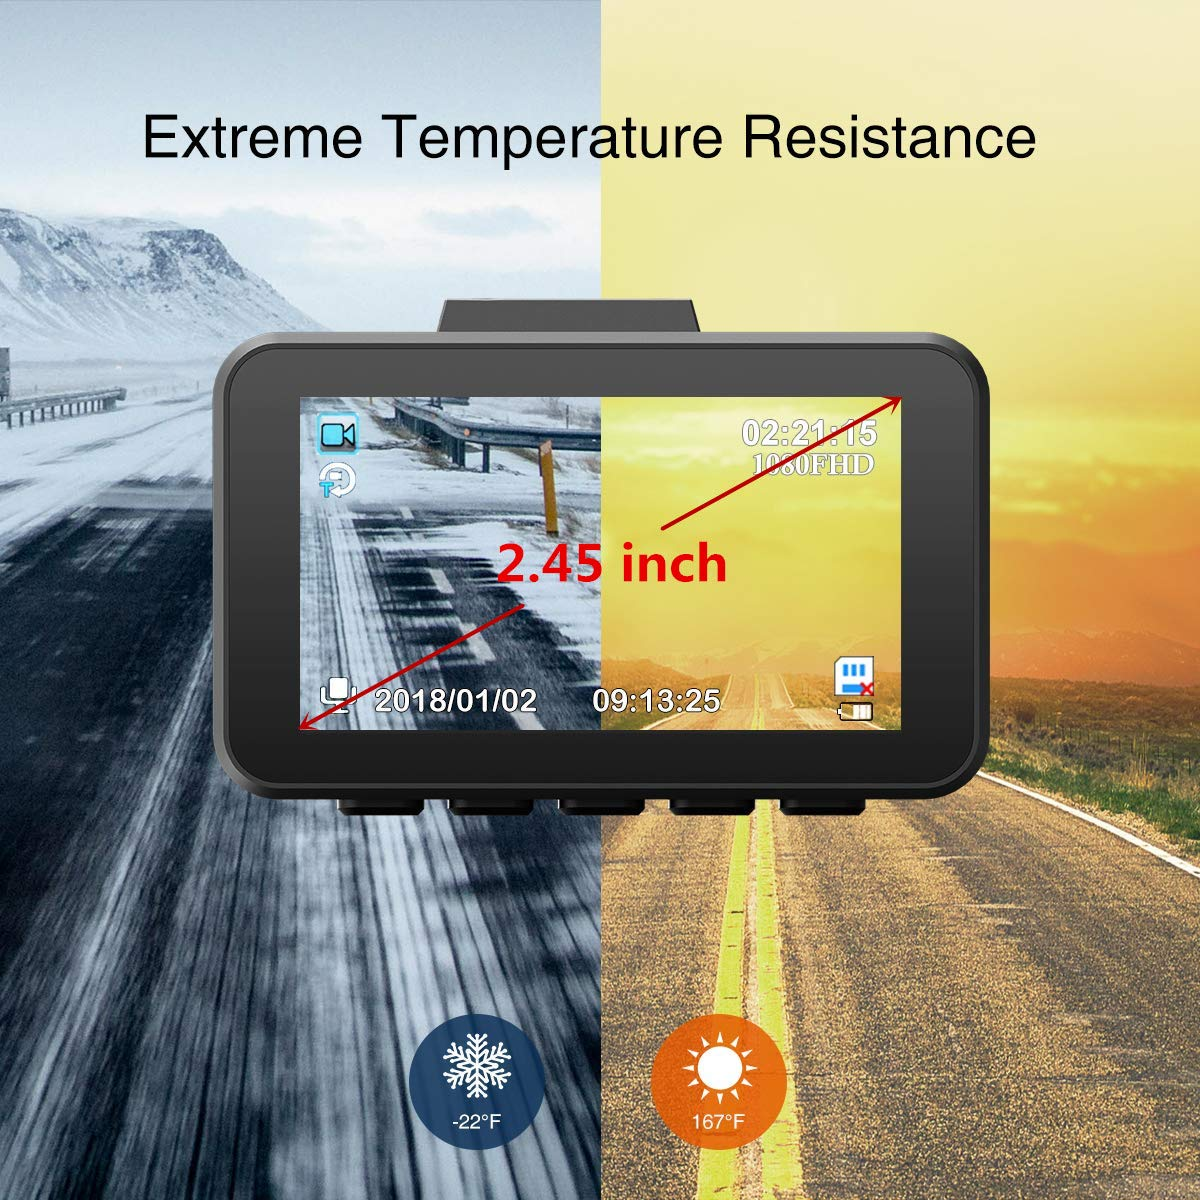 Loop Recording WDR WiMiUS Dash Cam Full HD Car Camera 1080P Dashboard Camera Driving Recorder for Cars 2.45 LCD Screen 170/°Wide Angle G-Sensor Night Vision Parking Monitor